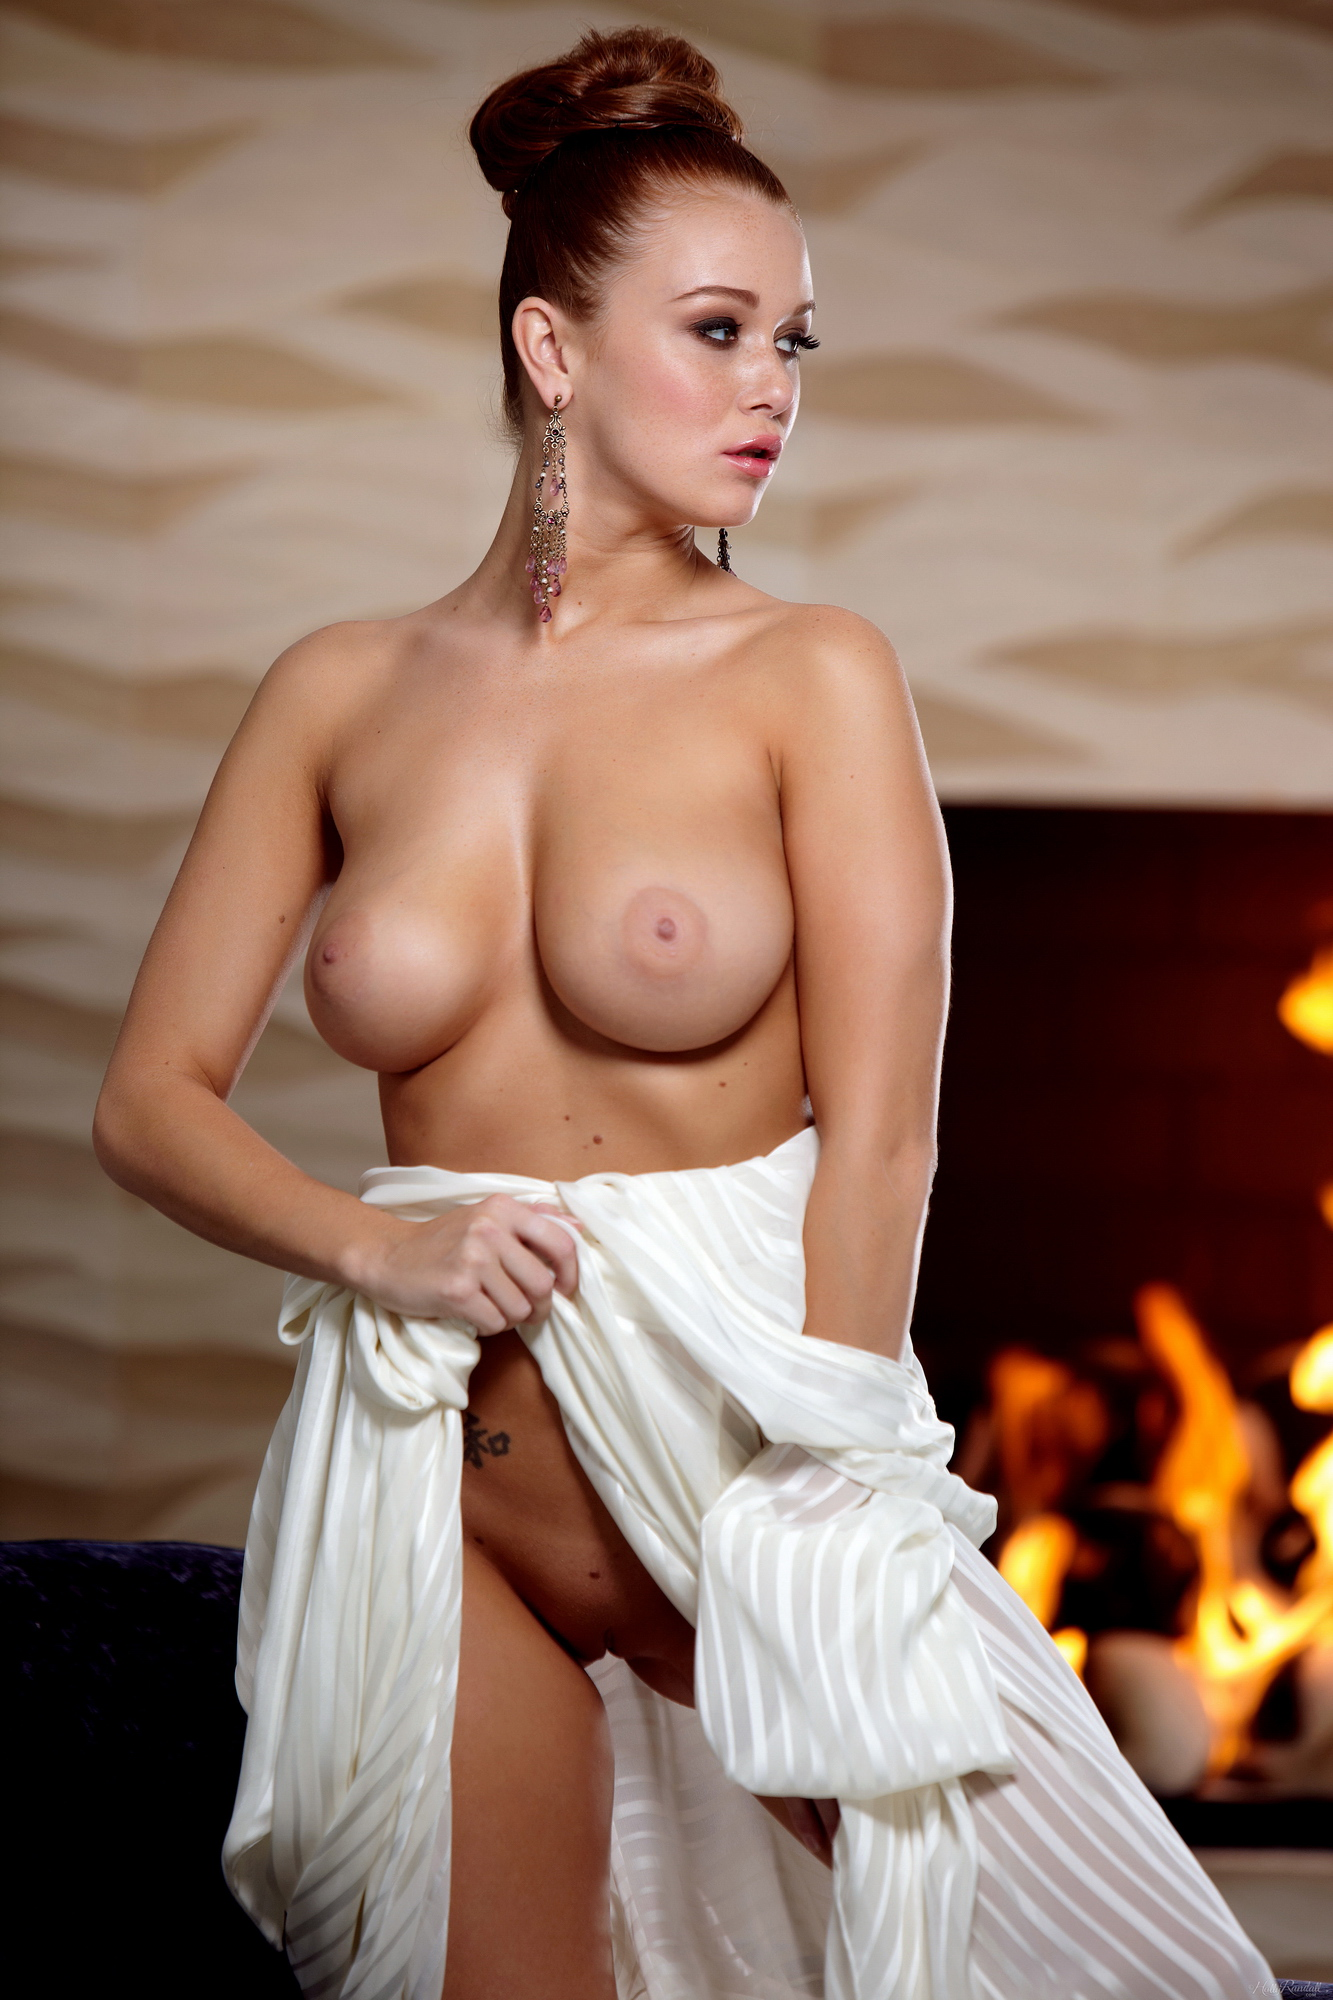 leanna-decker-nude-fireplace-redhead-hollyrandall-10